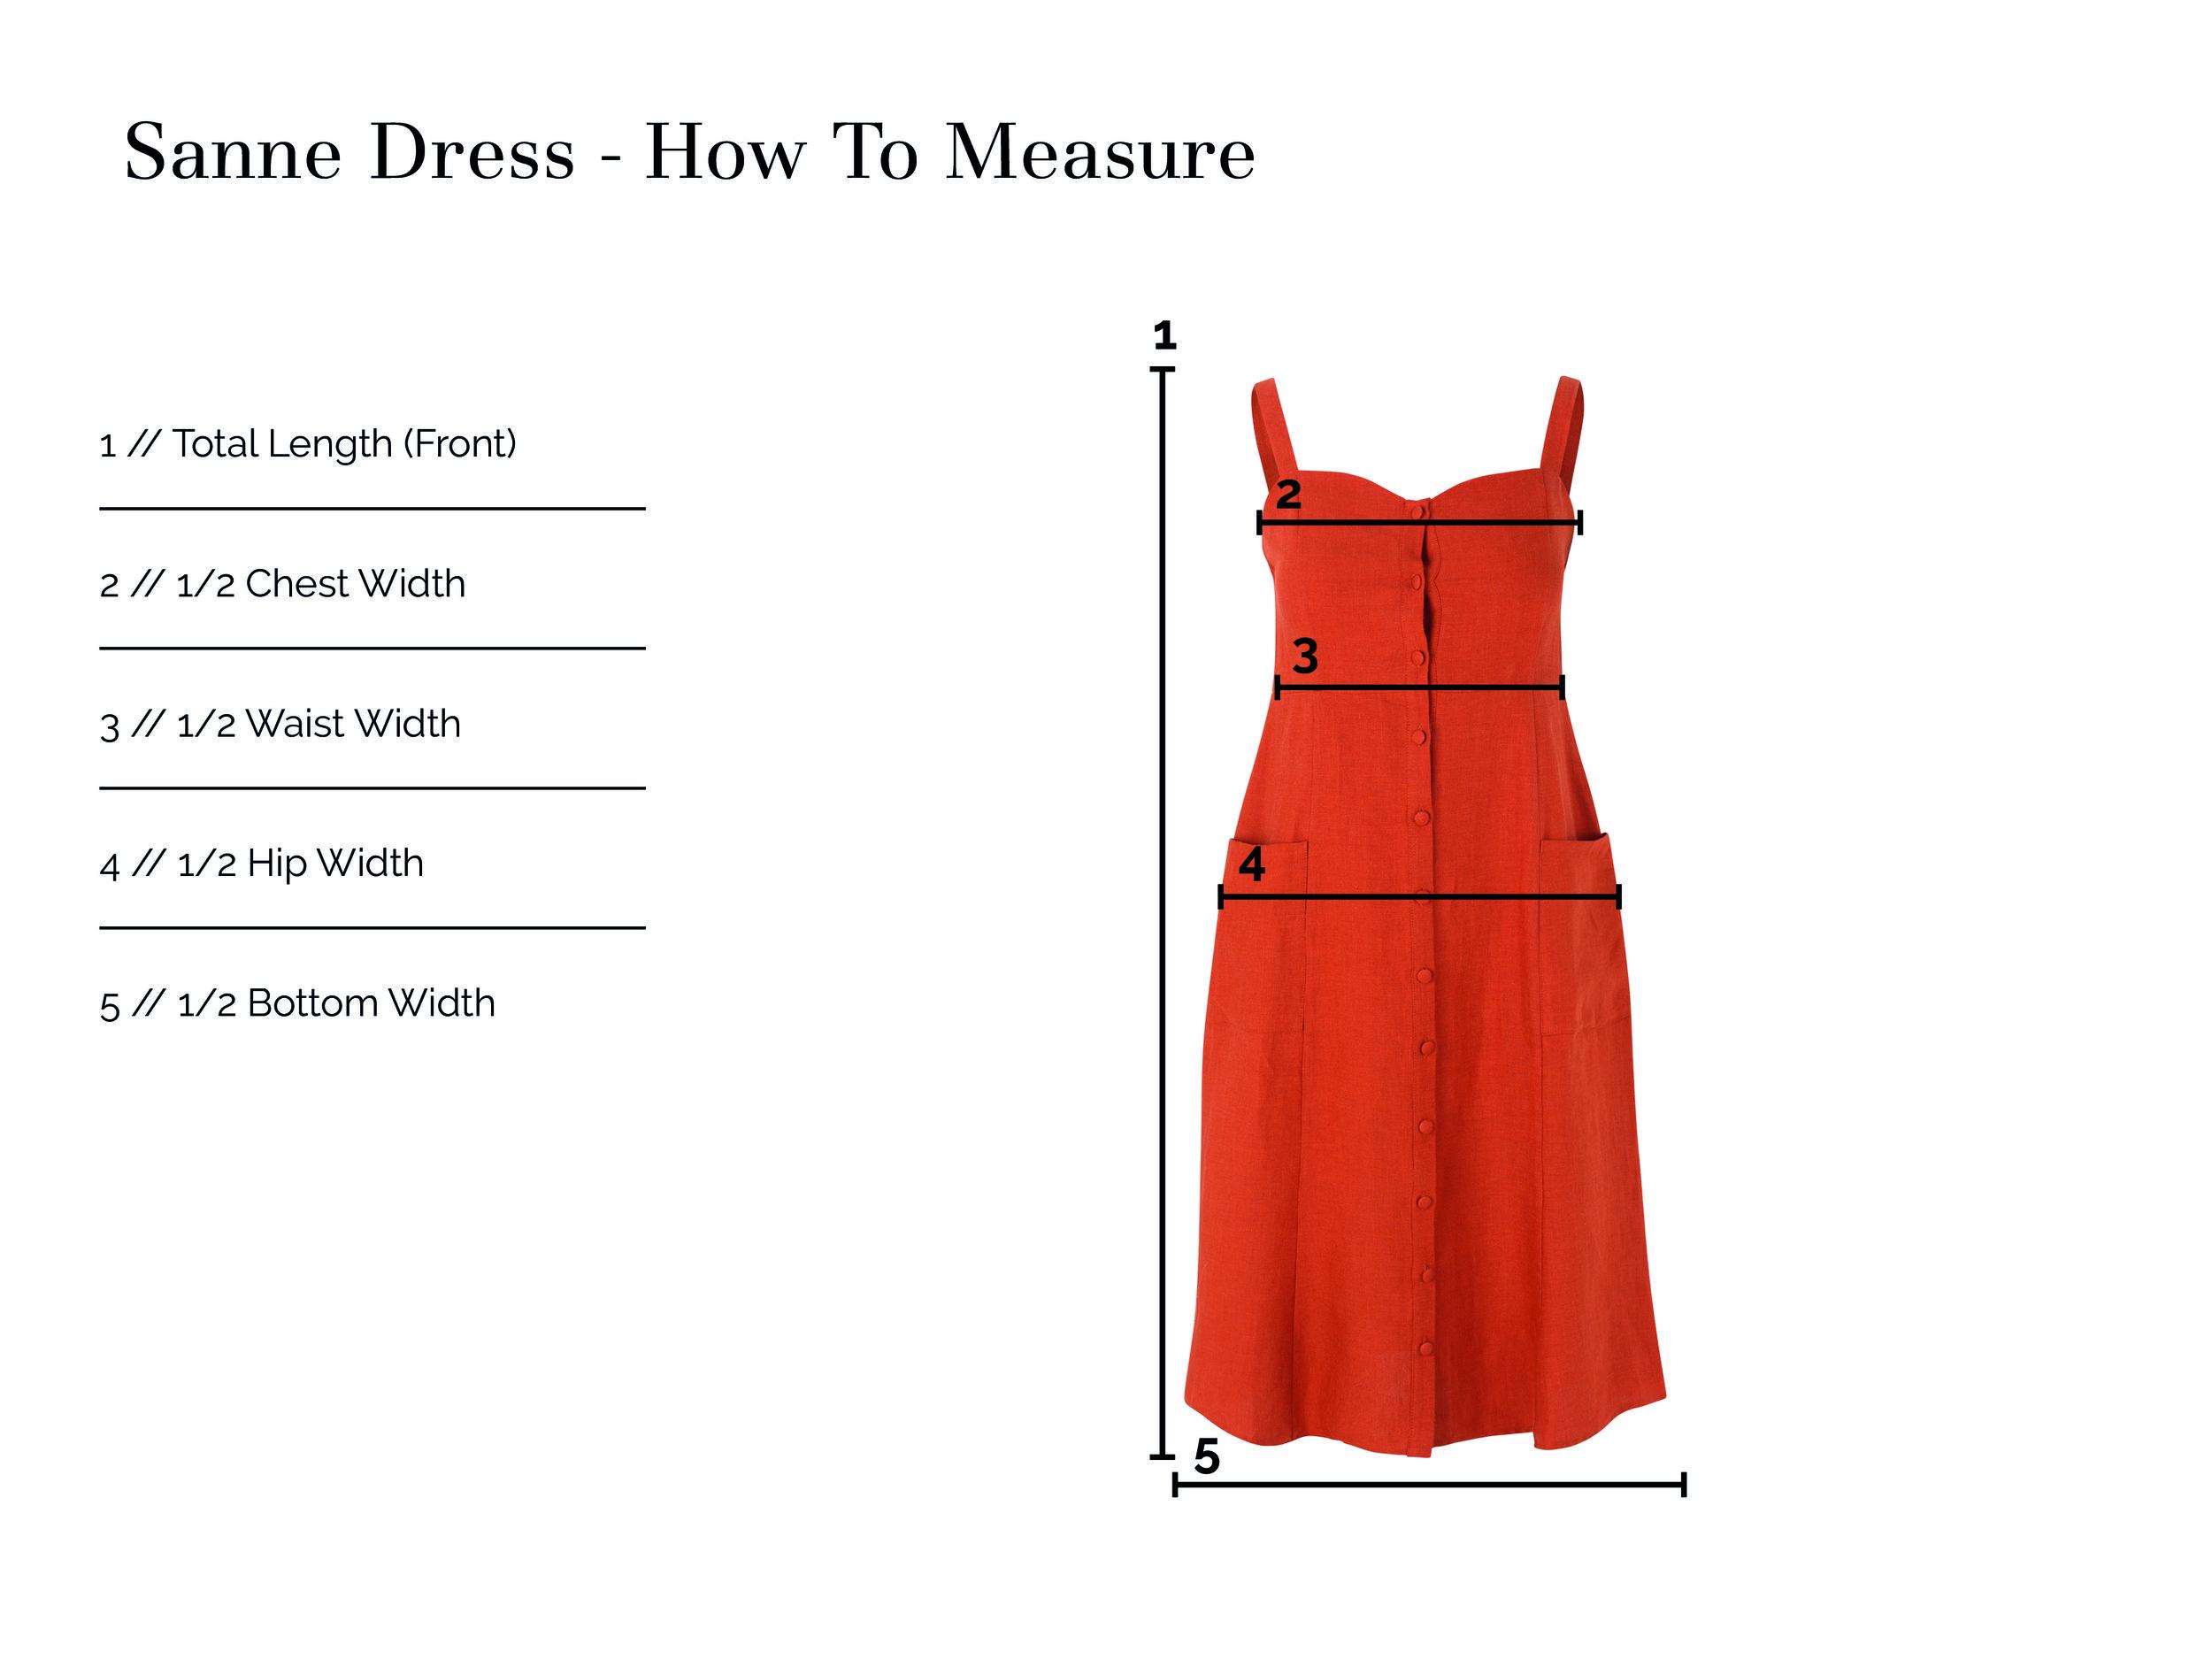 Sanne Dress - HTM.jpg